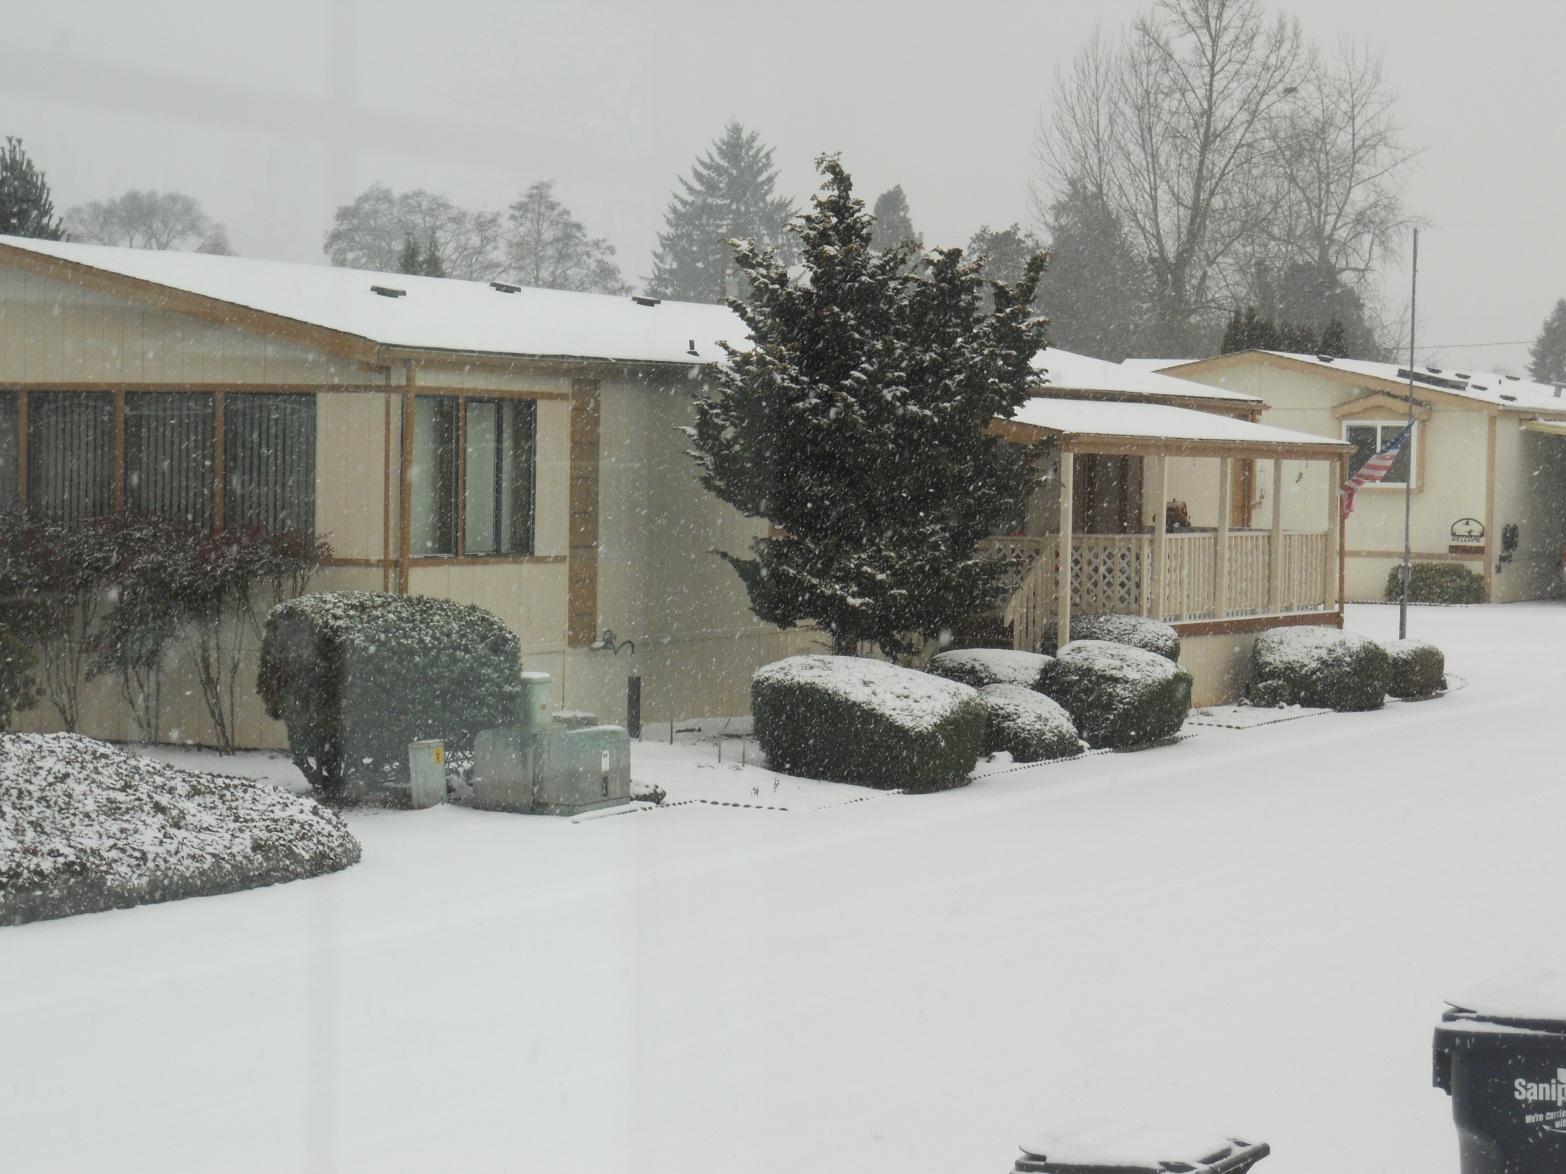 2-6-13 snow (5) Mom & Dad's house